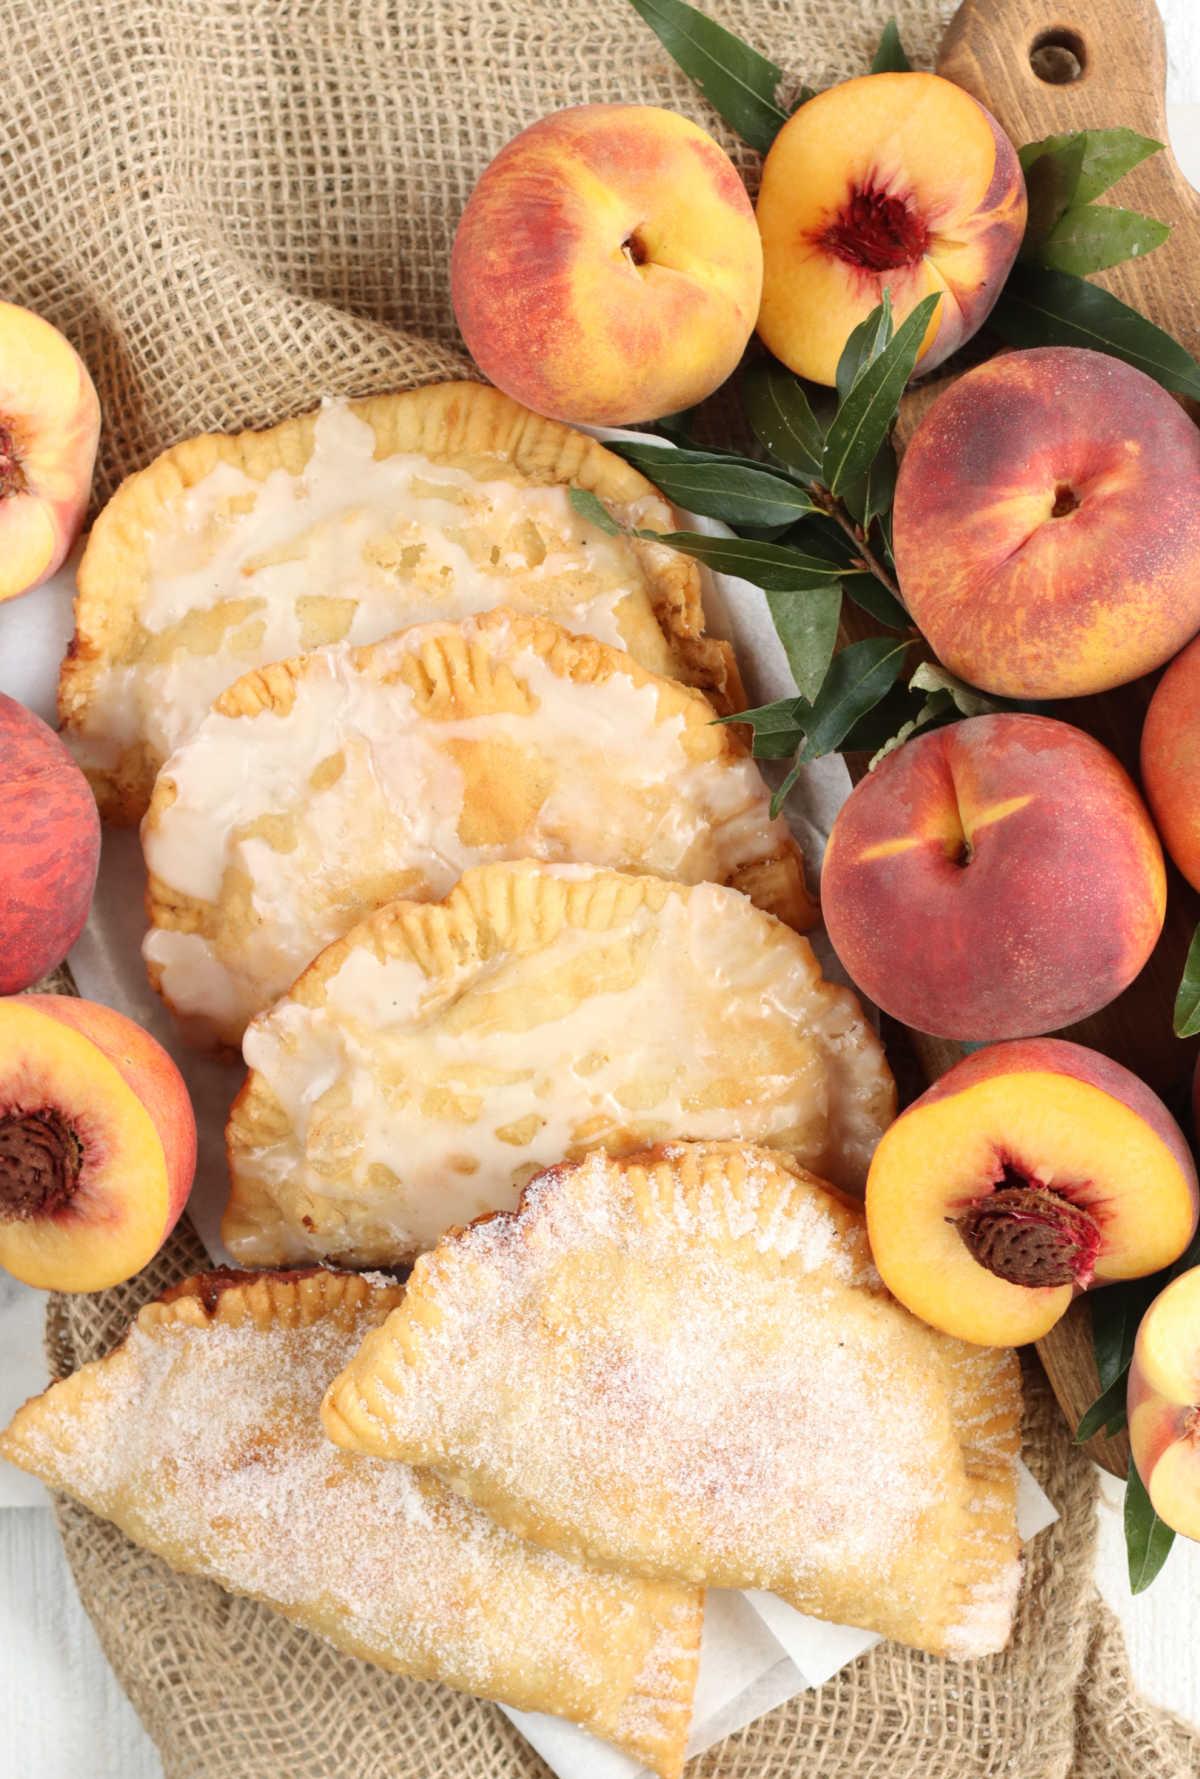 Fried peach pies on burlap, fresh peaches and halves around.